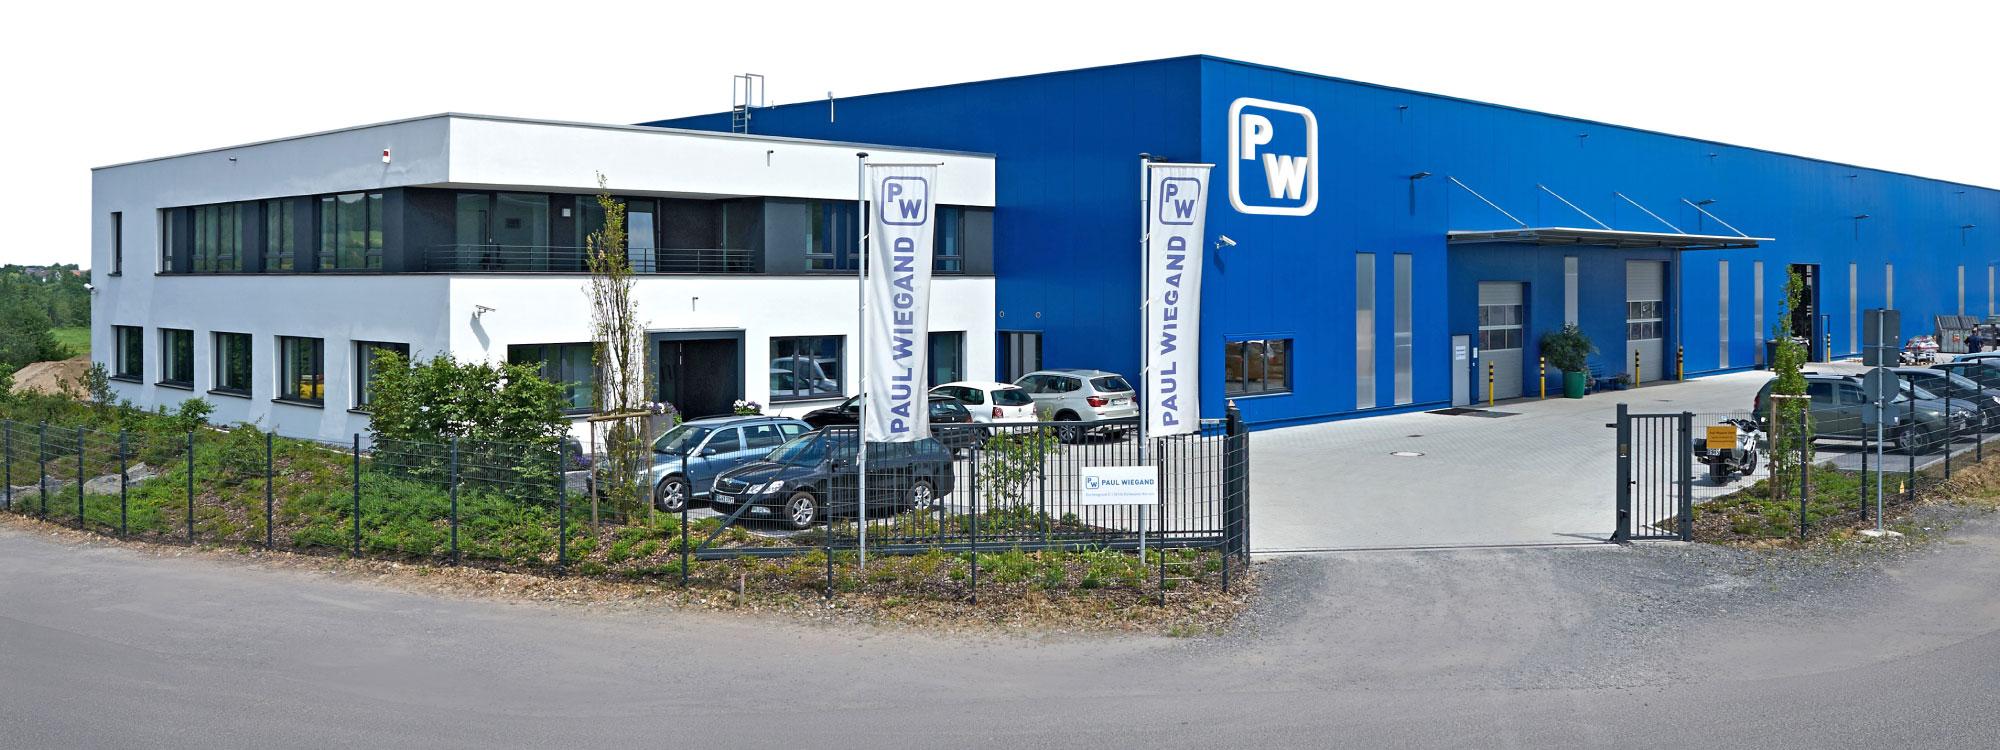 Paul Wiegand Gebäude Firma